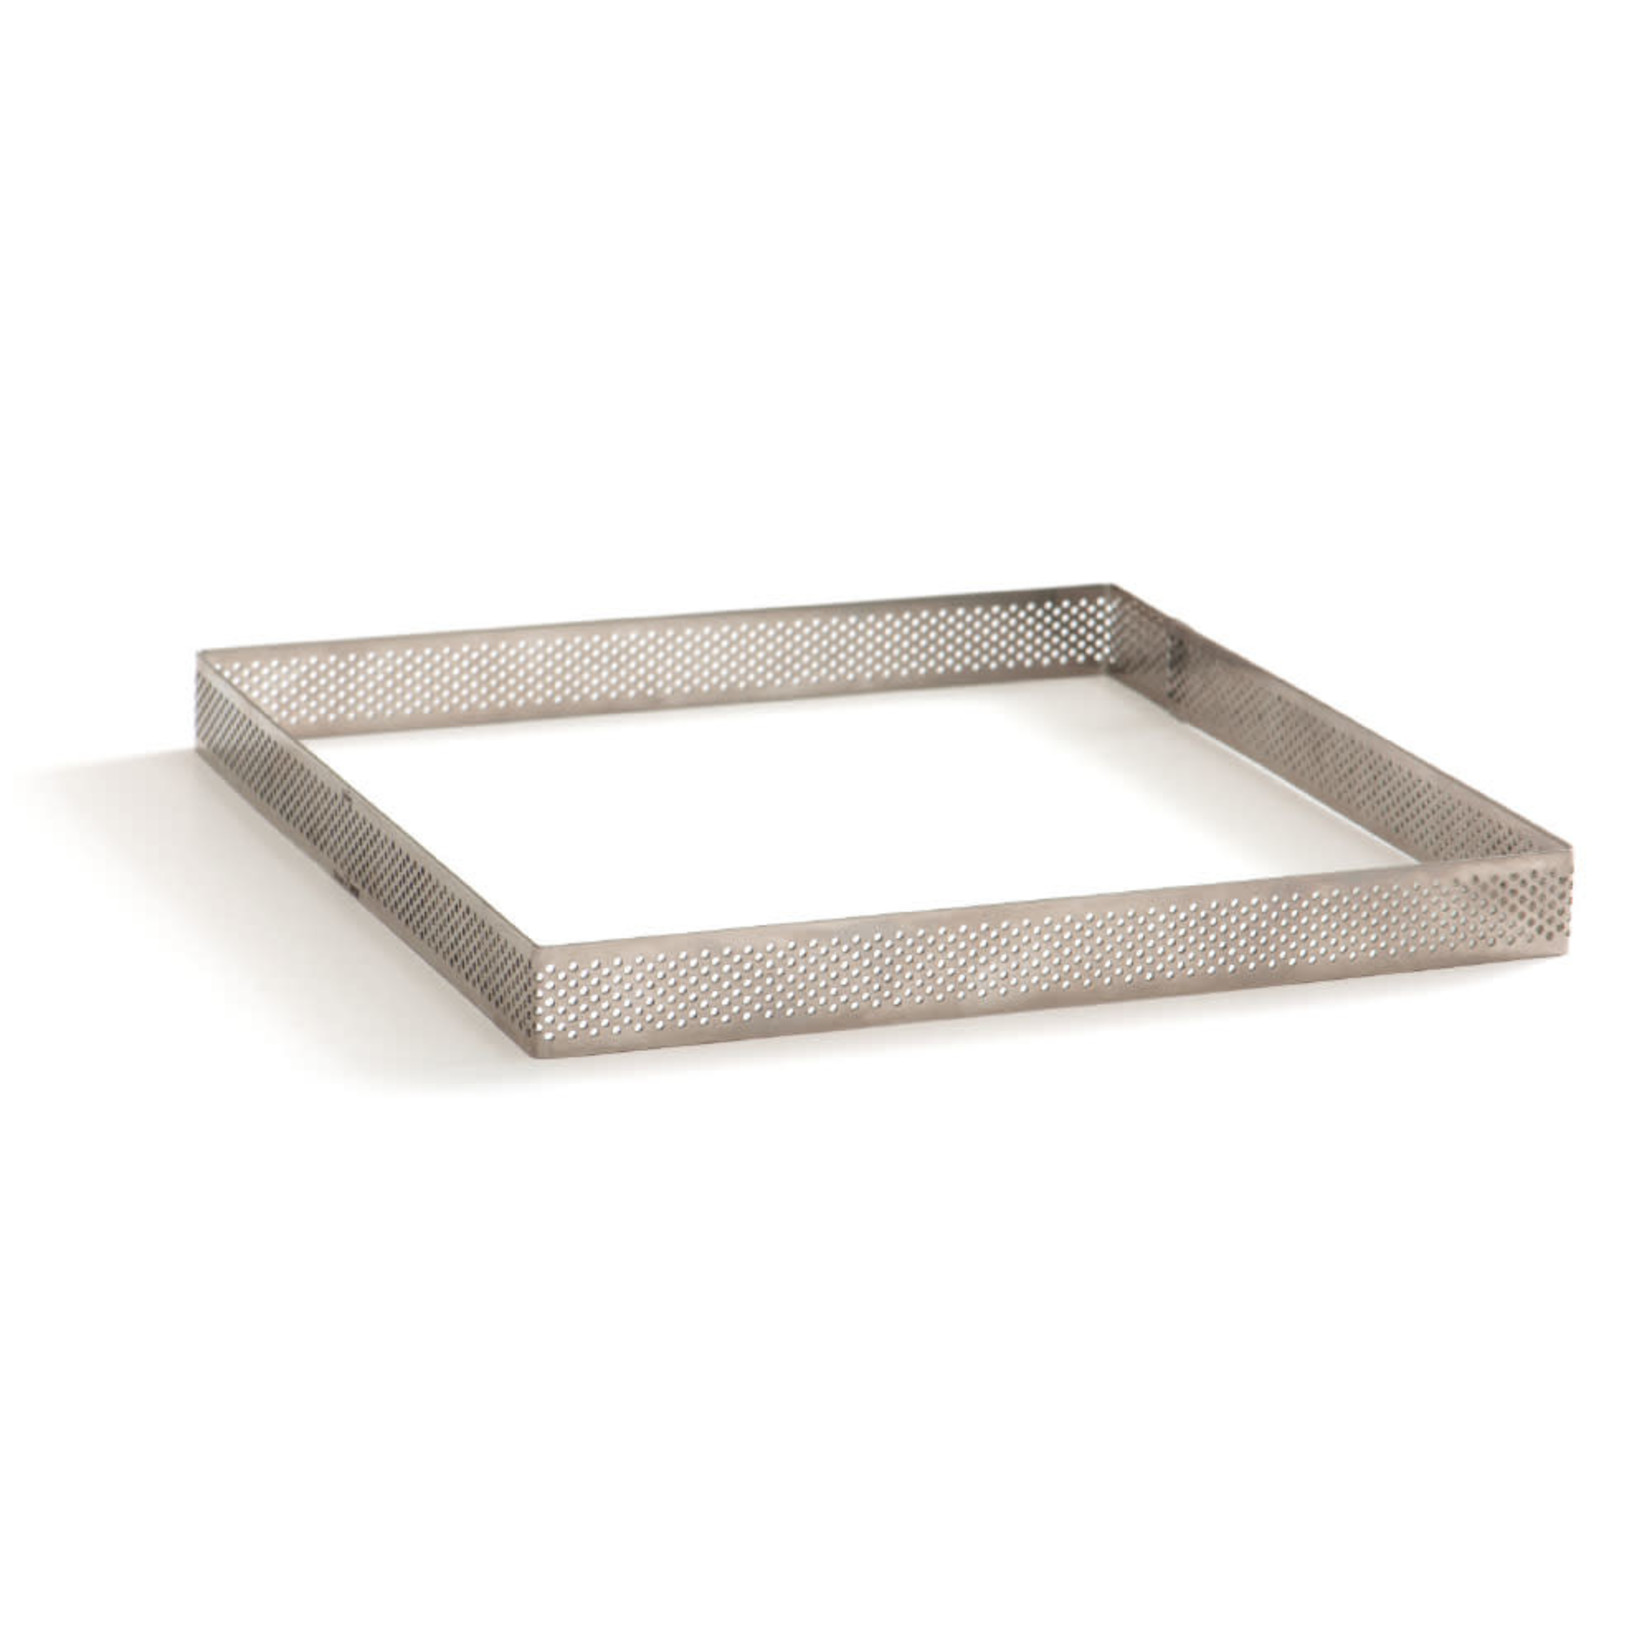 Decora Bakrand geperforeerd RVS vierkant 10x10x3,5